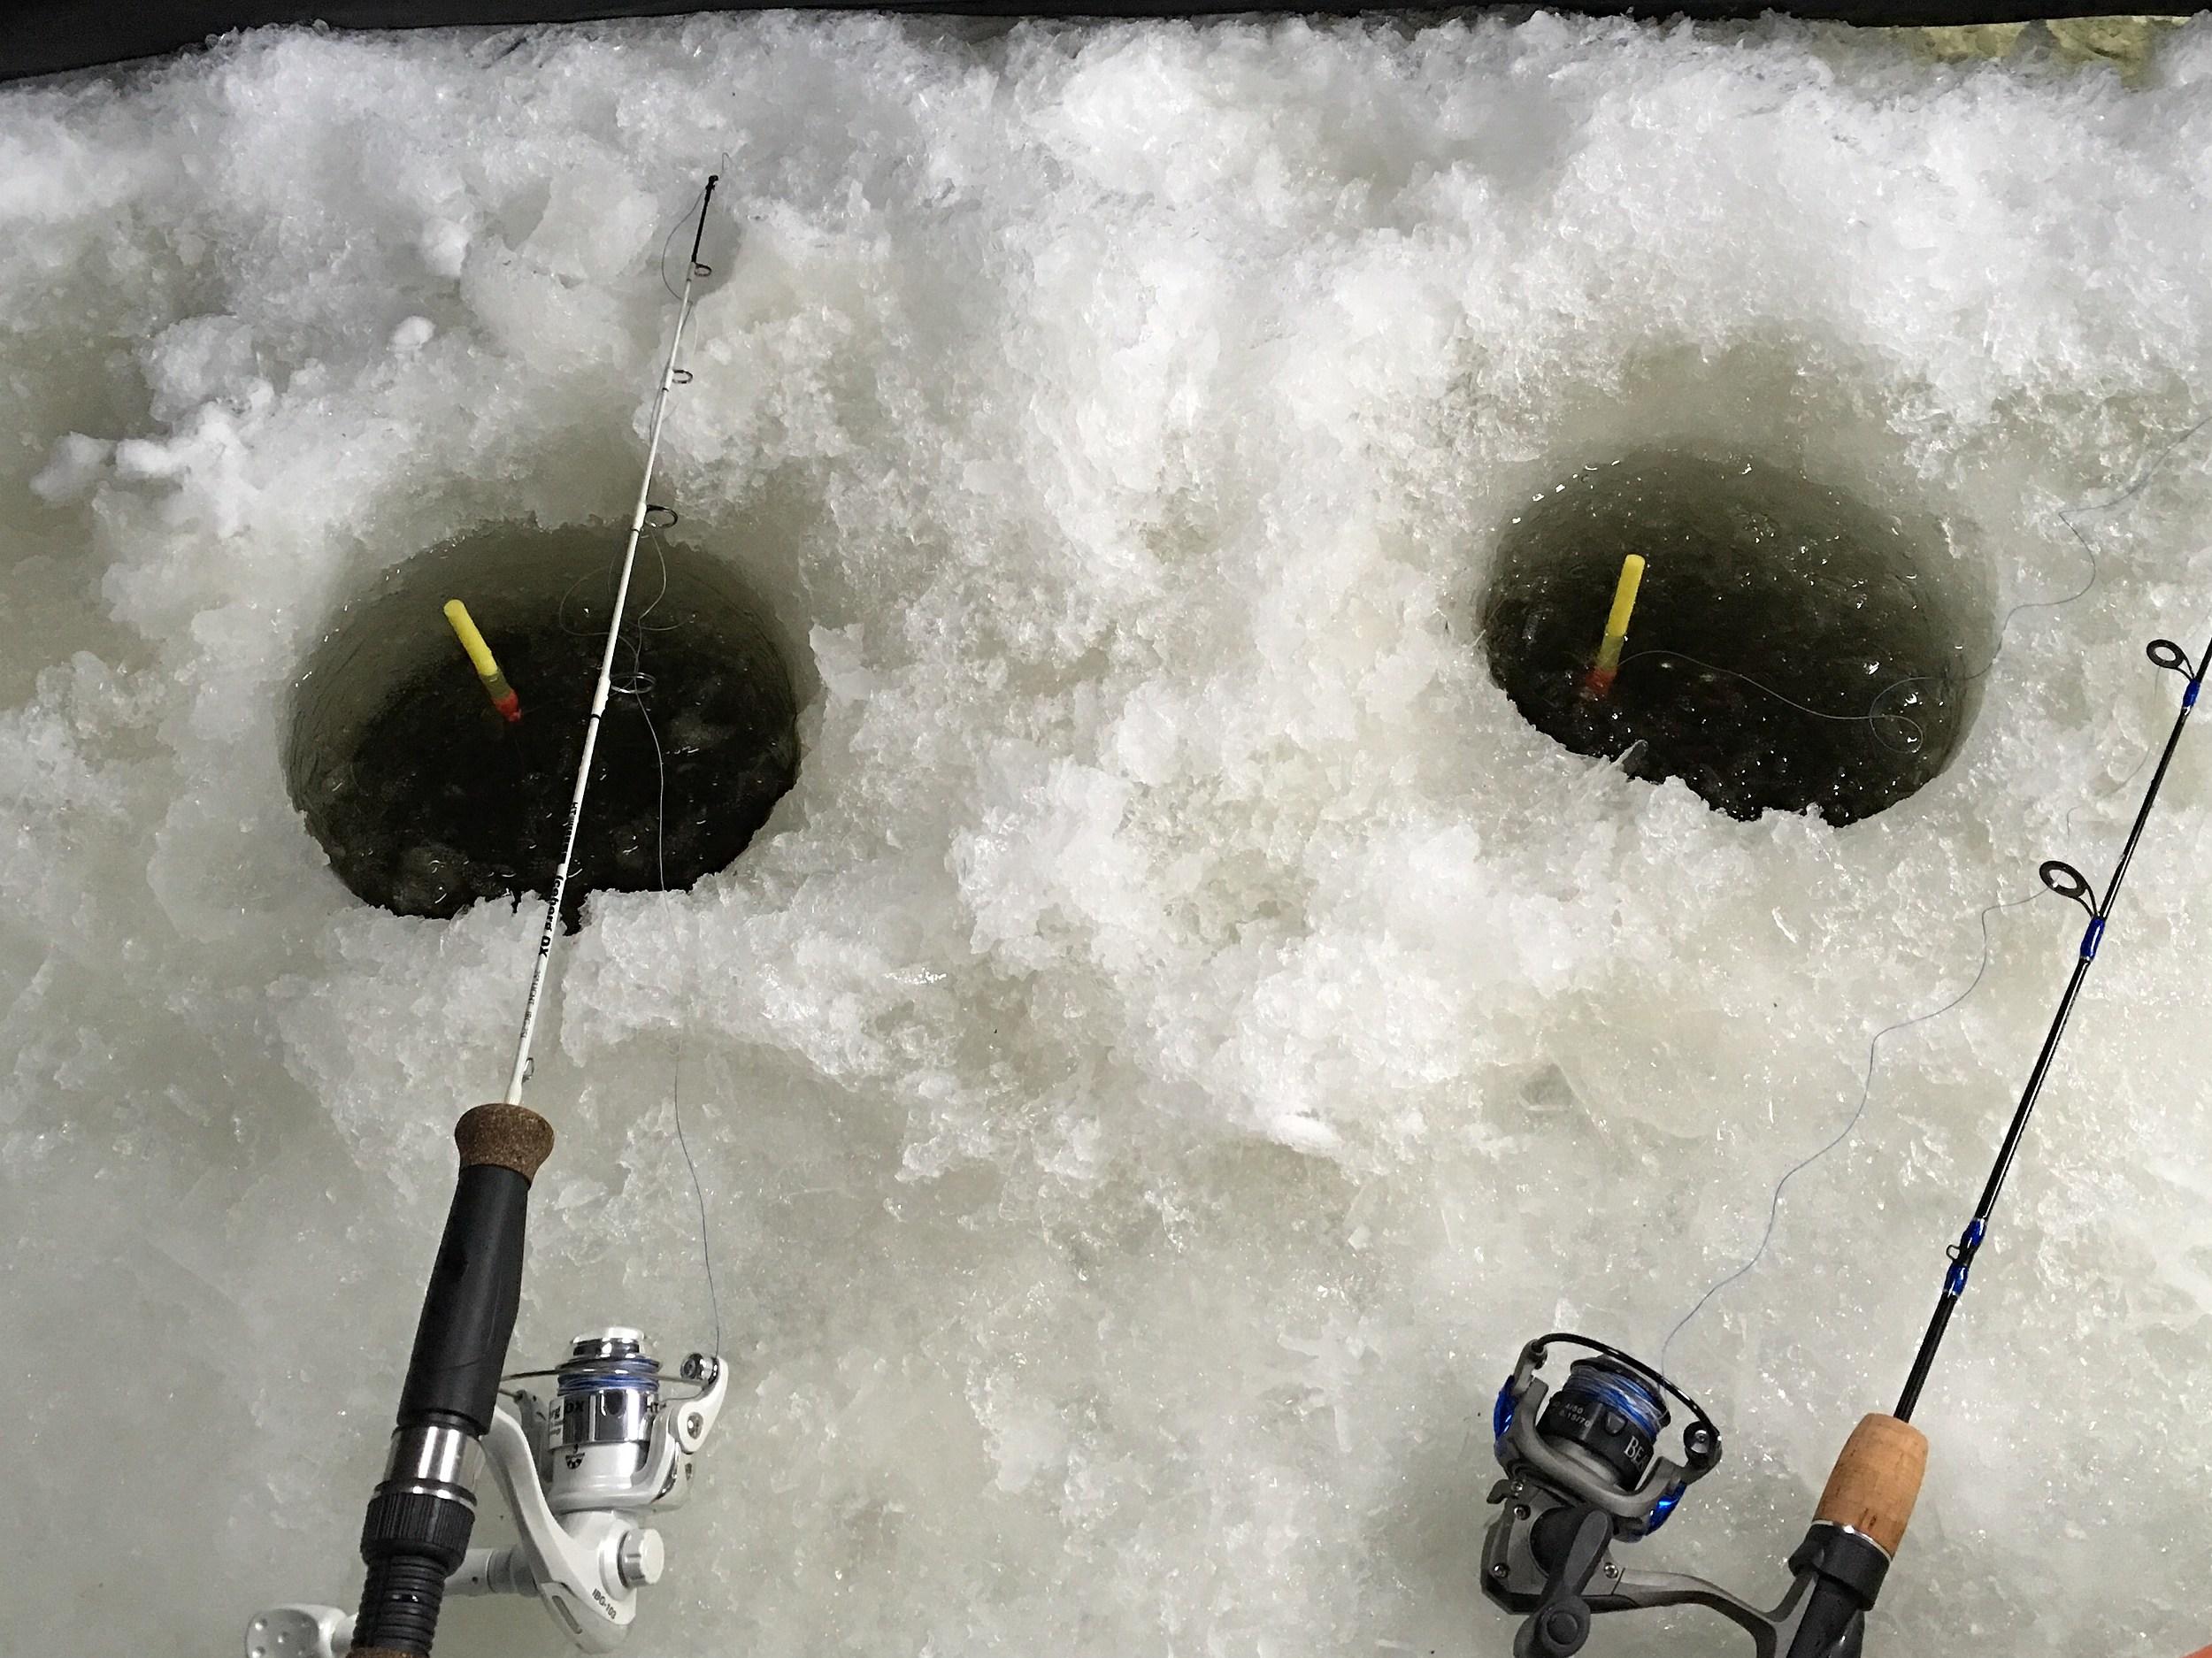 Take a kid ice fishing weekend starts saturday in minnesota for Minnesota fishing license age